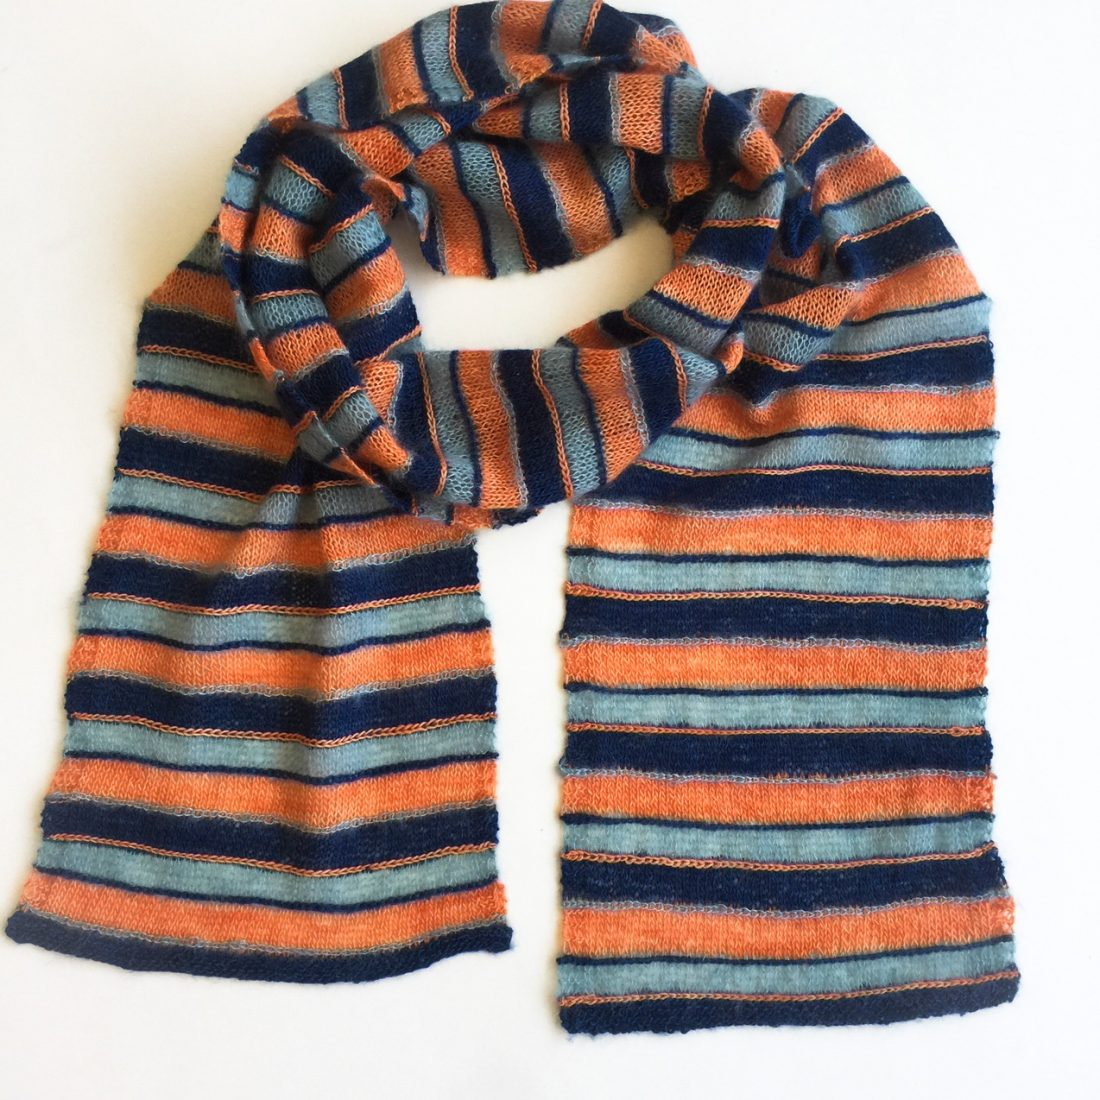 Stripe Away Scarf free knit pattern by Cowgirlblues